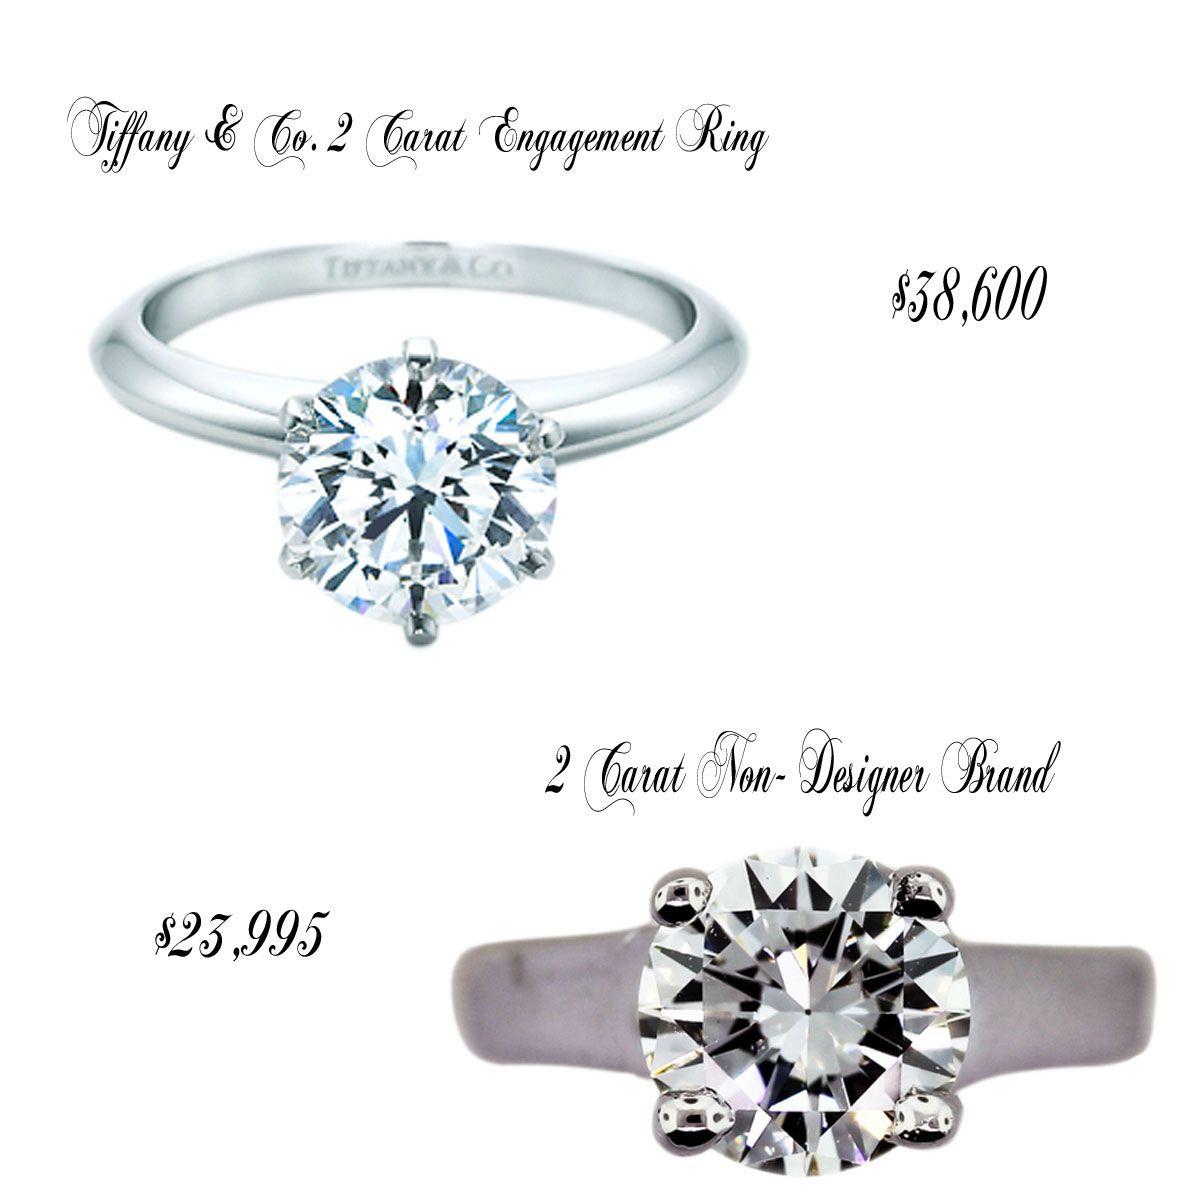 Wedding Tiffany Co Engagement Ring Vs Non Namebrand